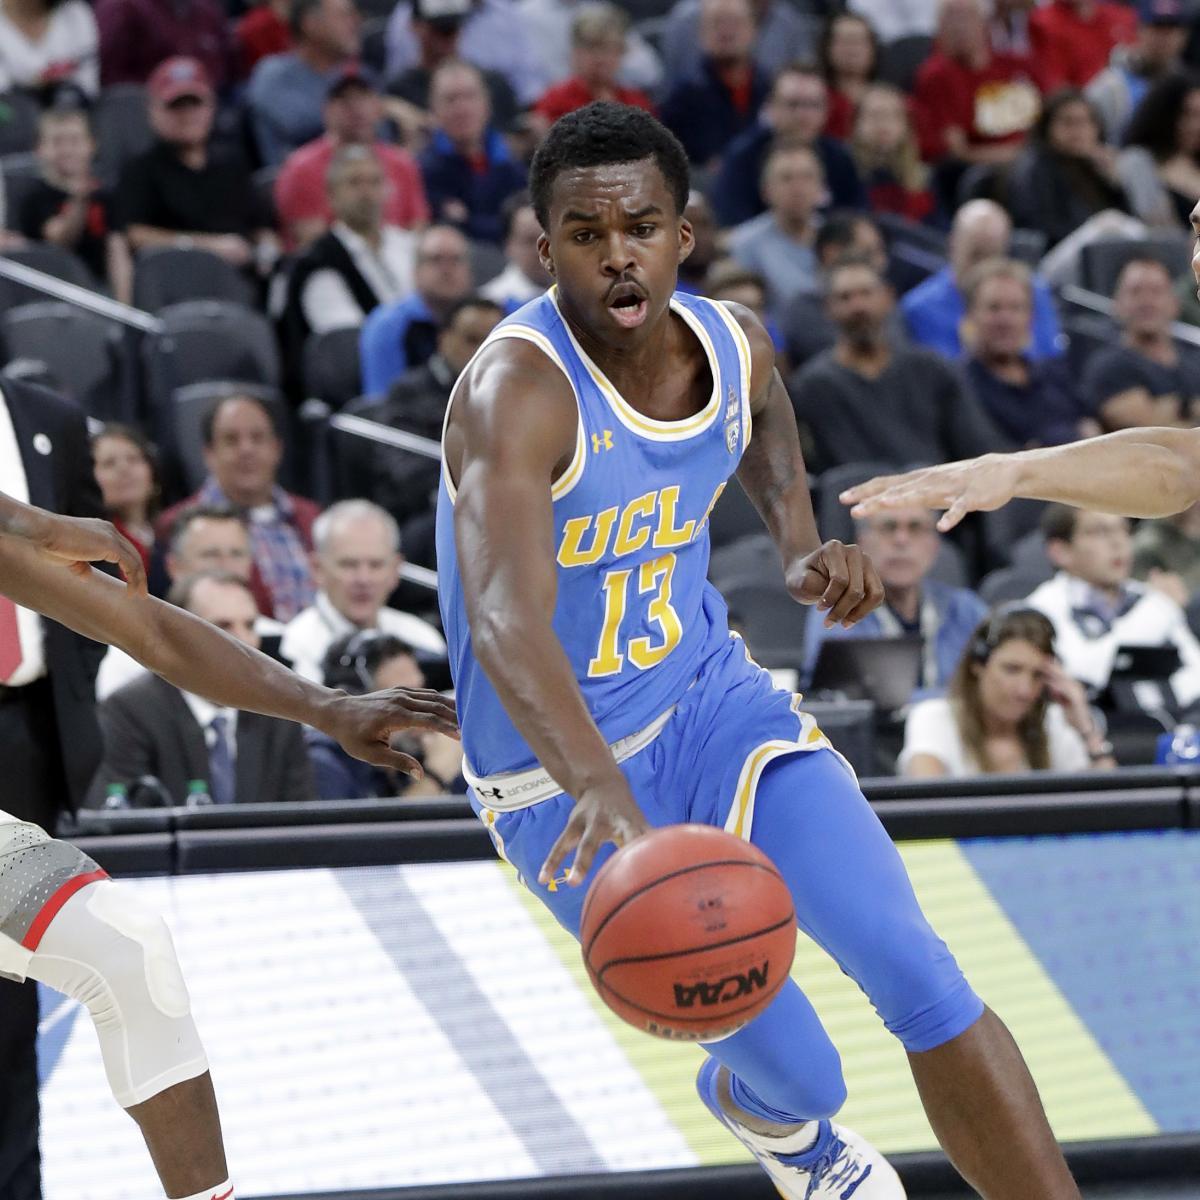 UCLA Bruins vs. St. Bonaventure Bonnies Odds, March Madness Betting Pick